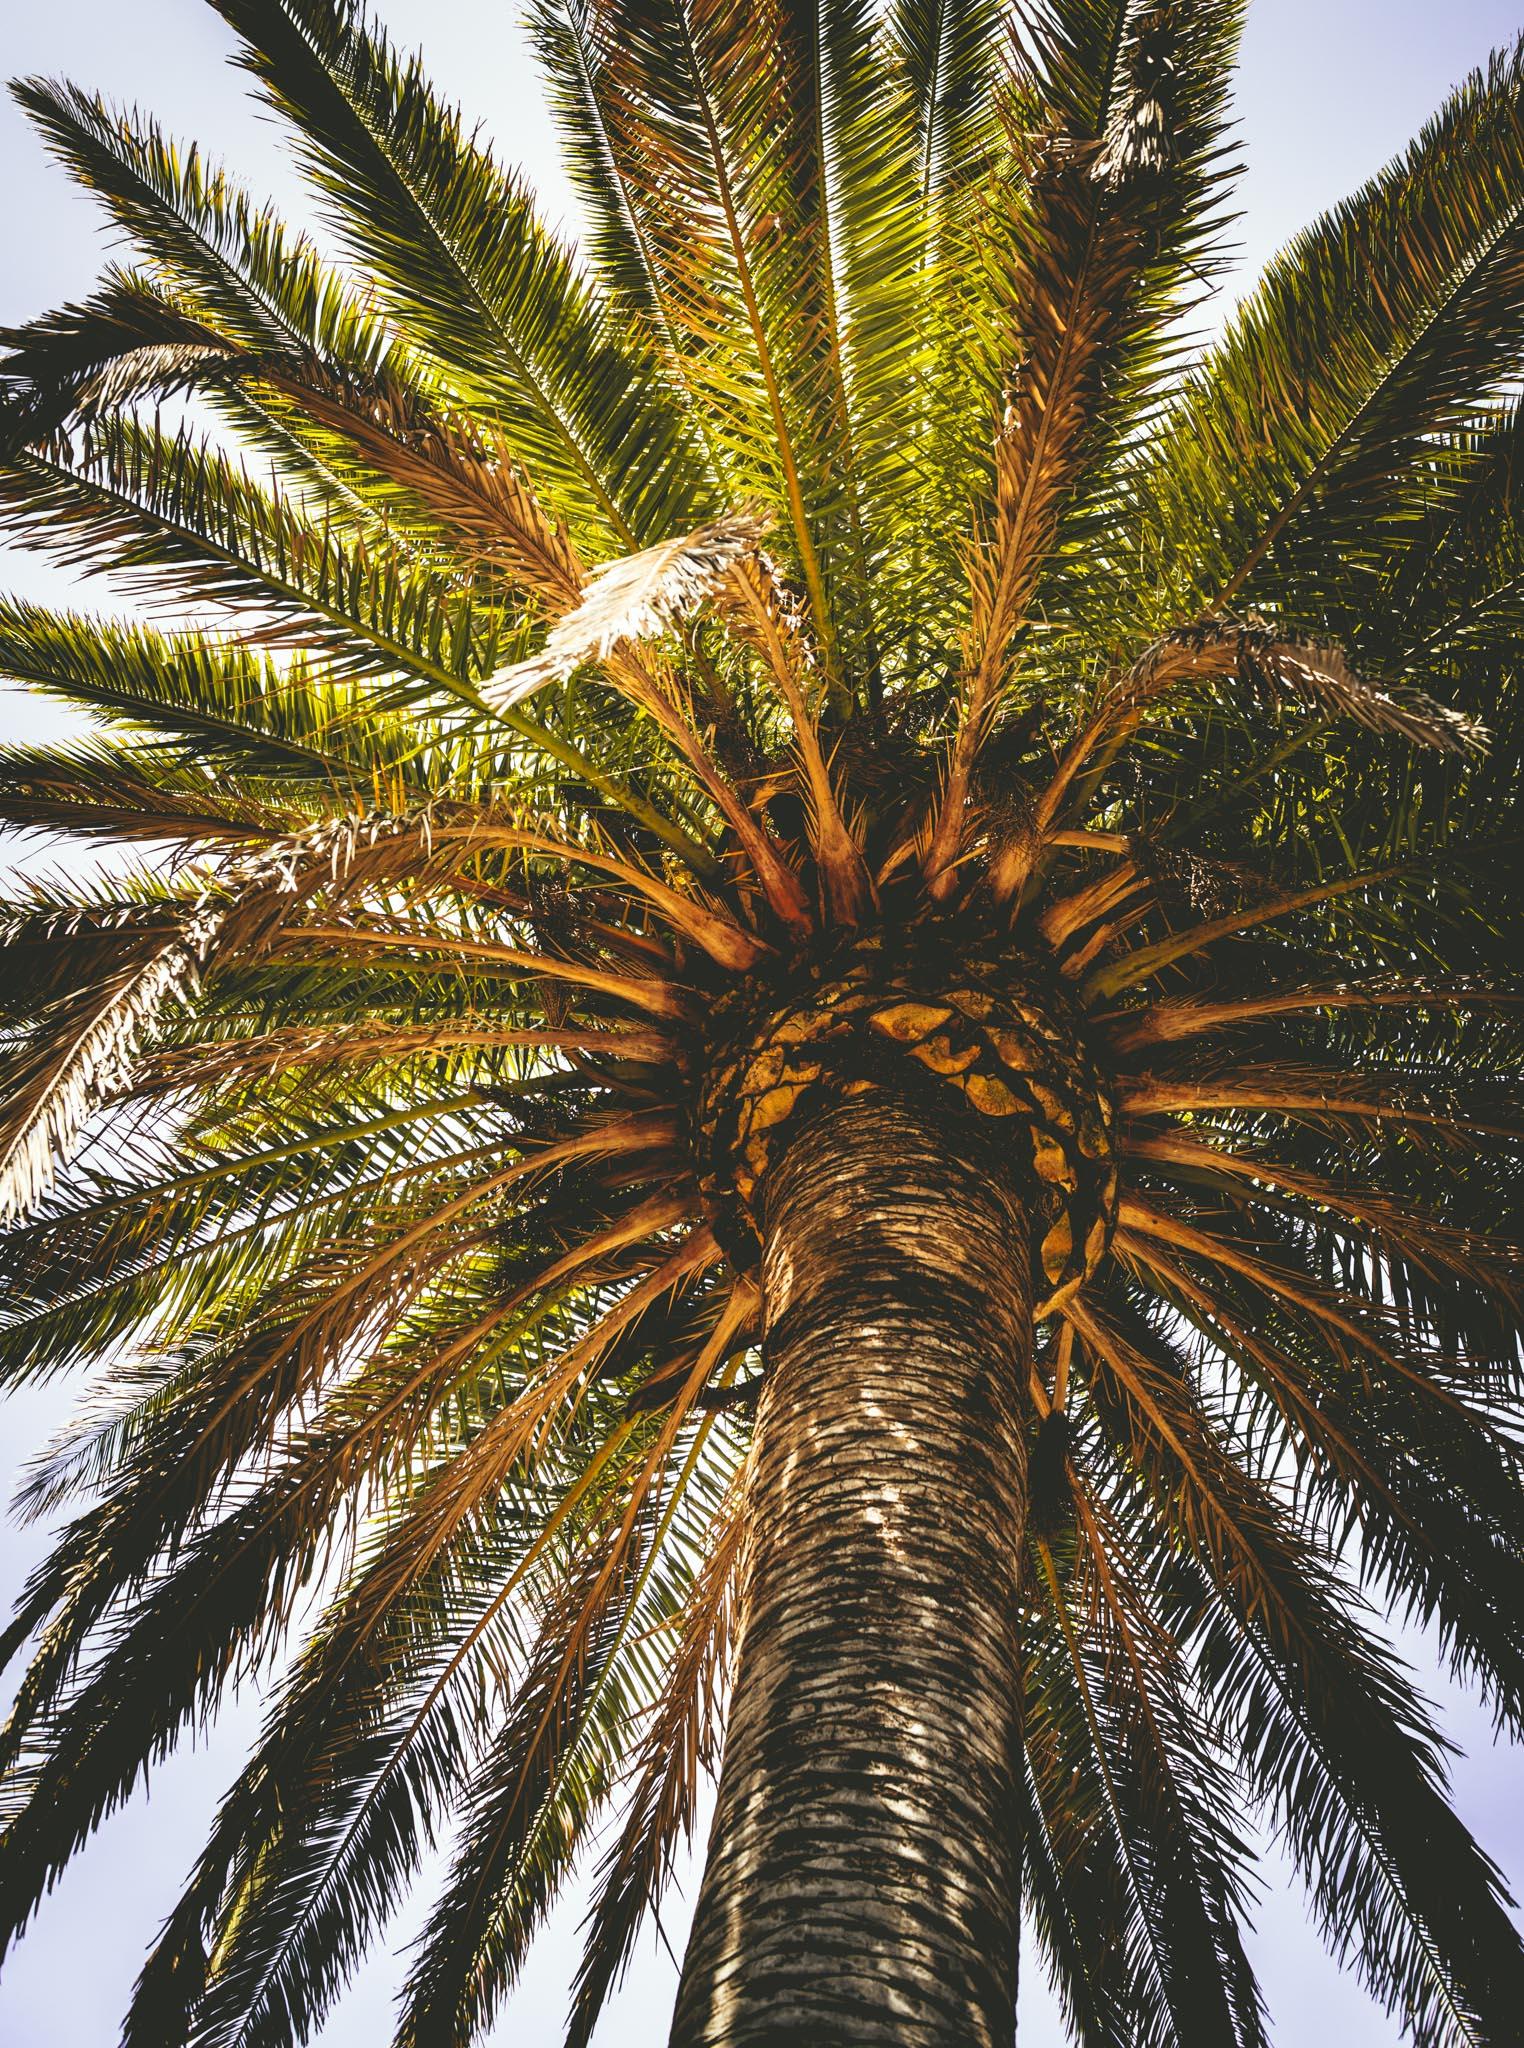 California : Napa Valley : Palm tree outside Corison in St. Helena